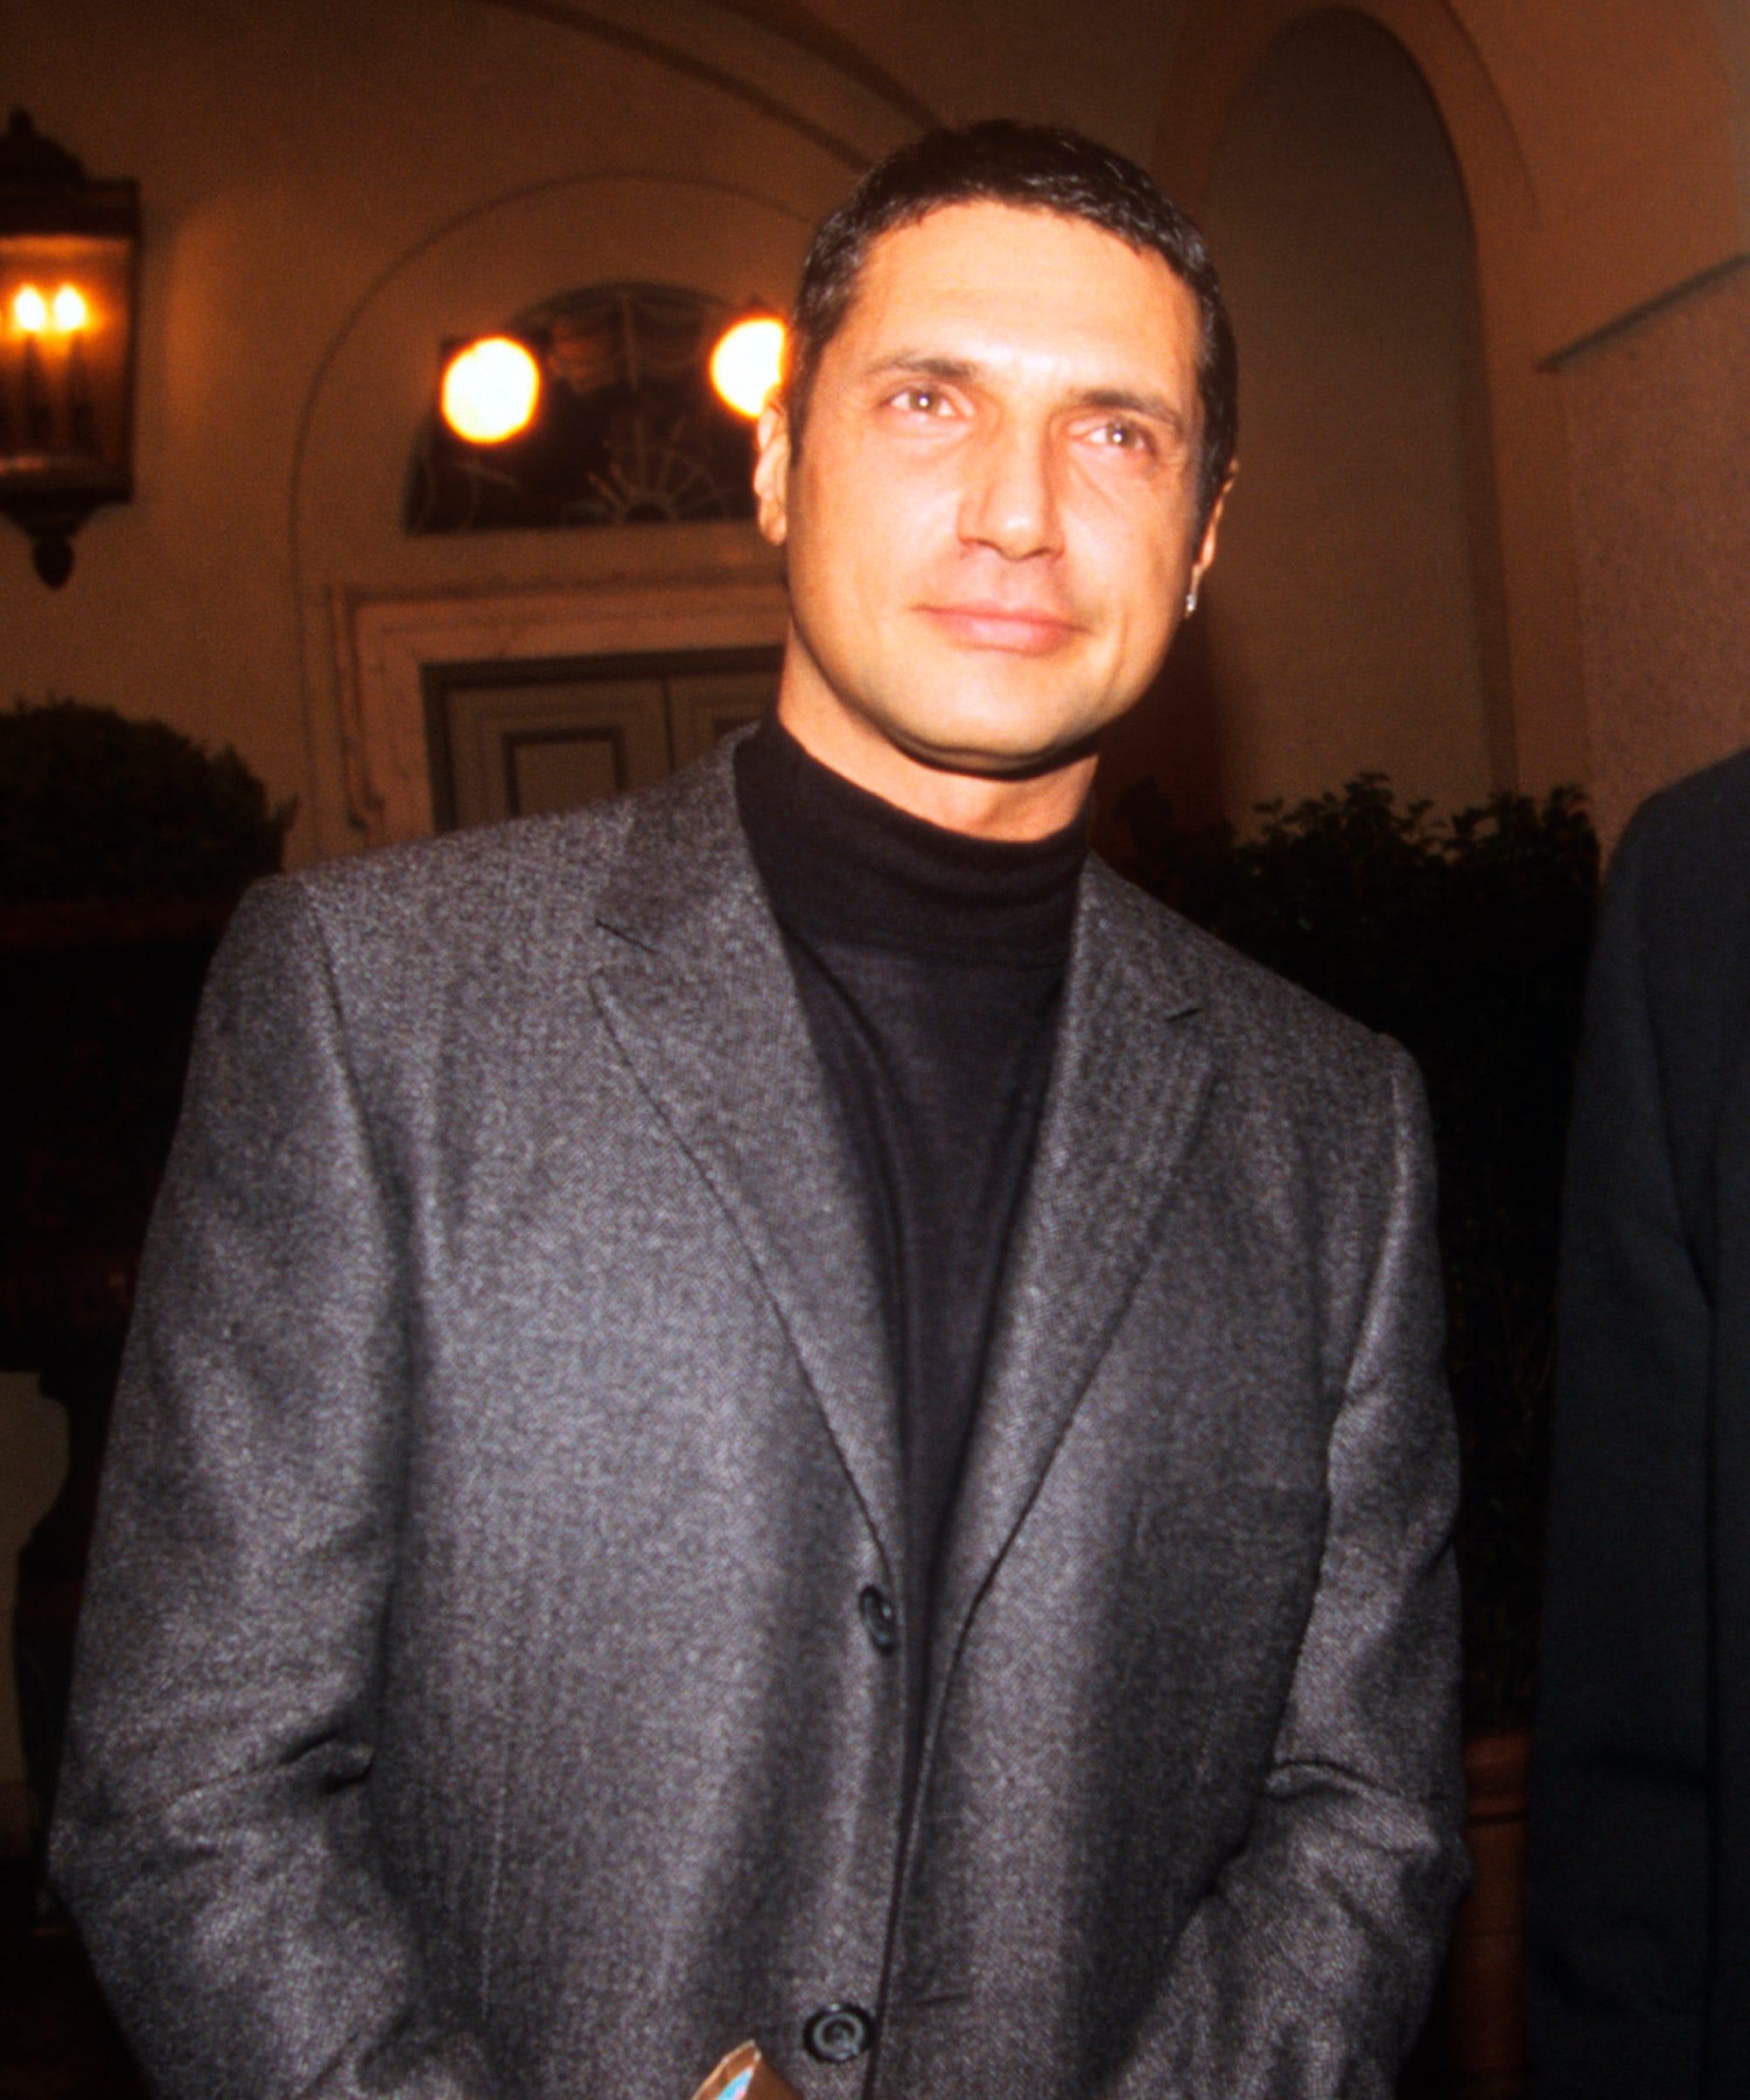 Alberto D Amico did antonio d'amico, versace boyfriend, kill himself